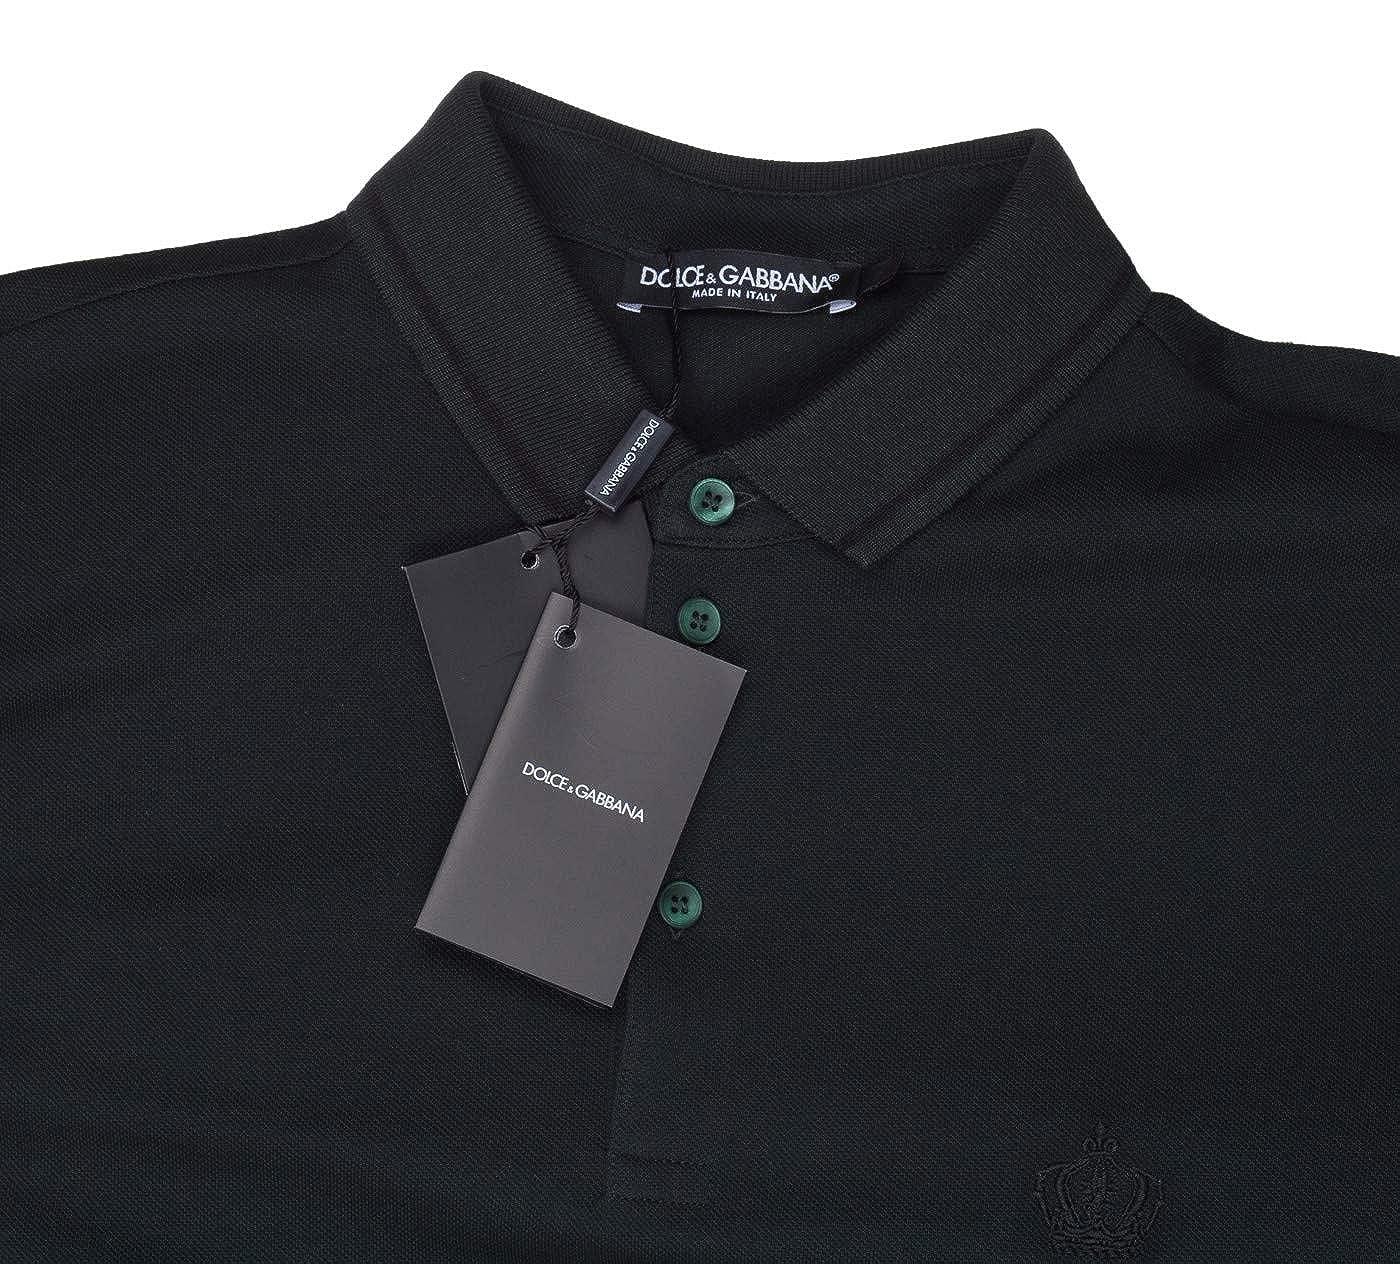 c80459a75 Amazon.com: Dolce & Gabbana Men's Dark Green Crown 'Corona' Short Sleeve  Polo Shirt, Green, EU 48 / US S: Clothing